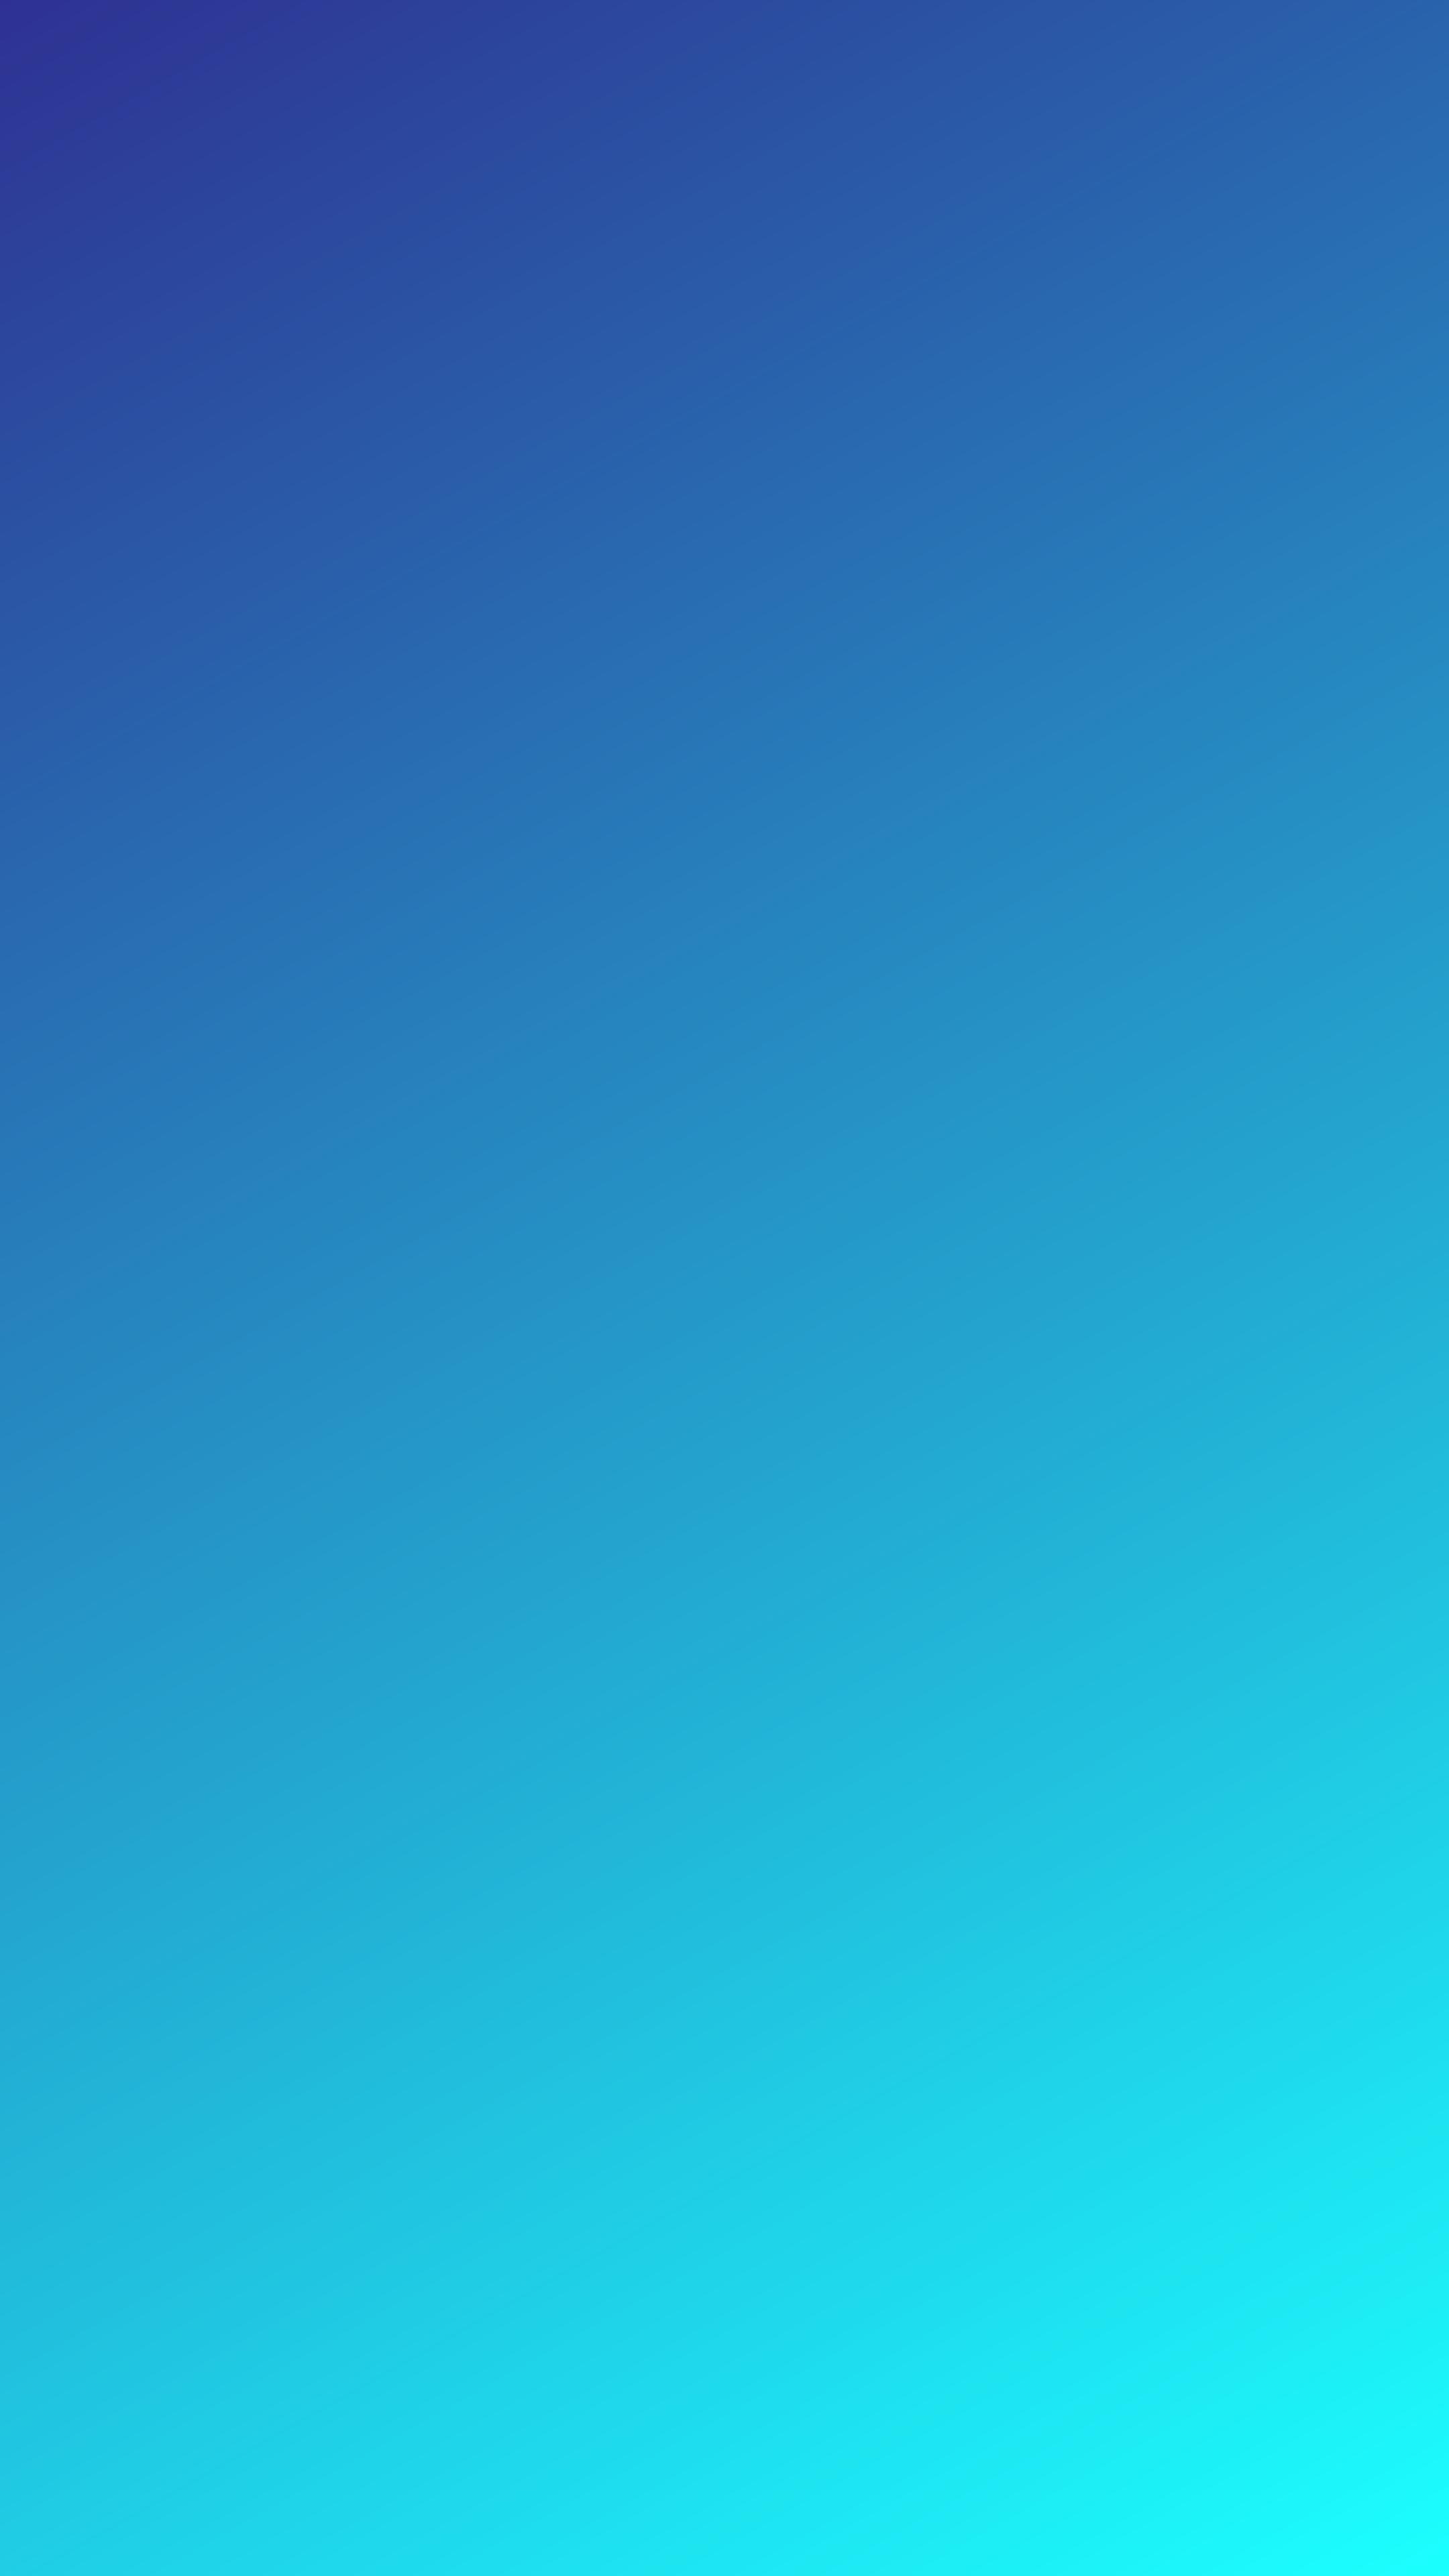 General 2160x3840 gradient minimalism blue turquise